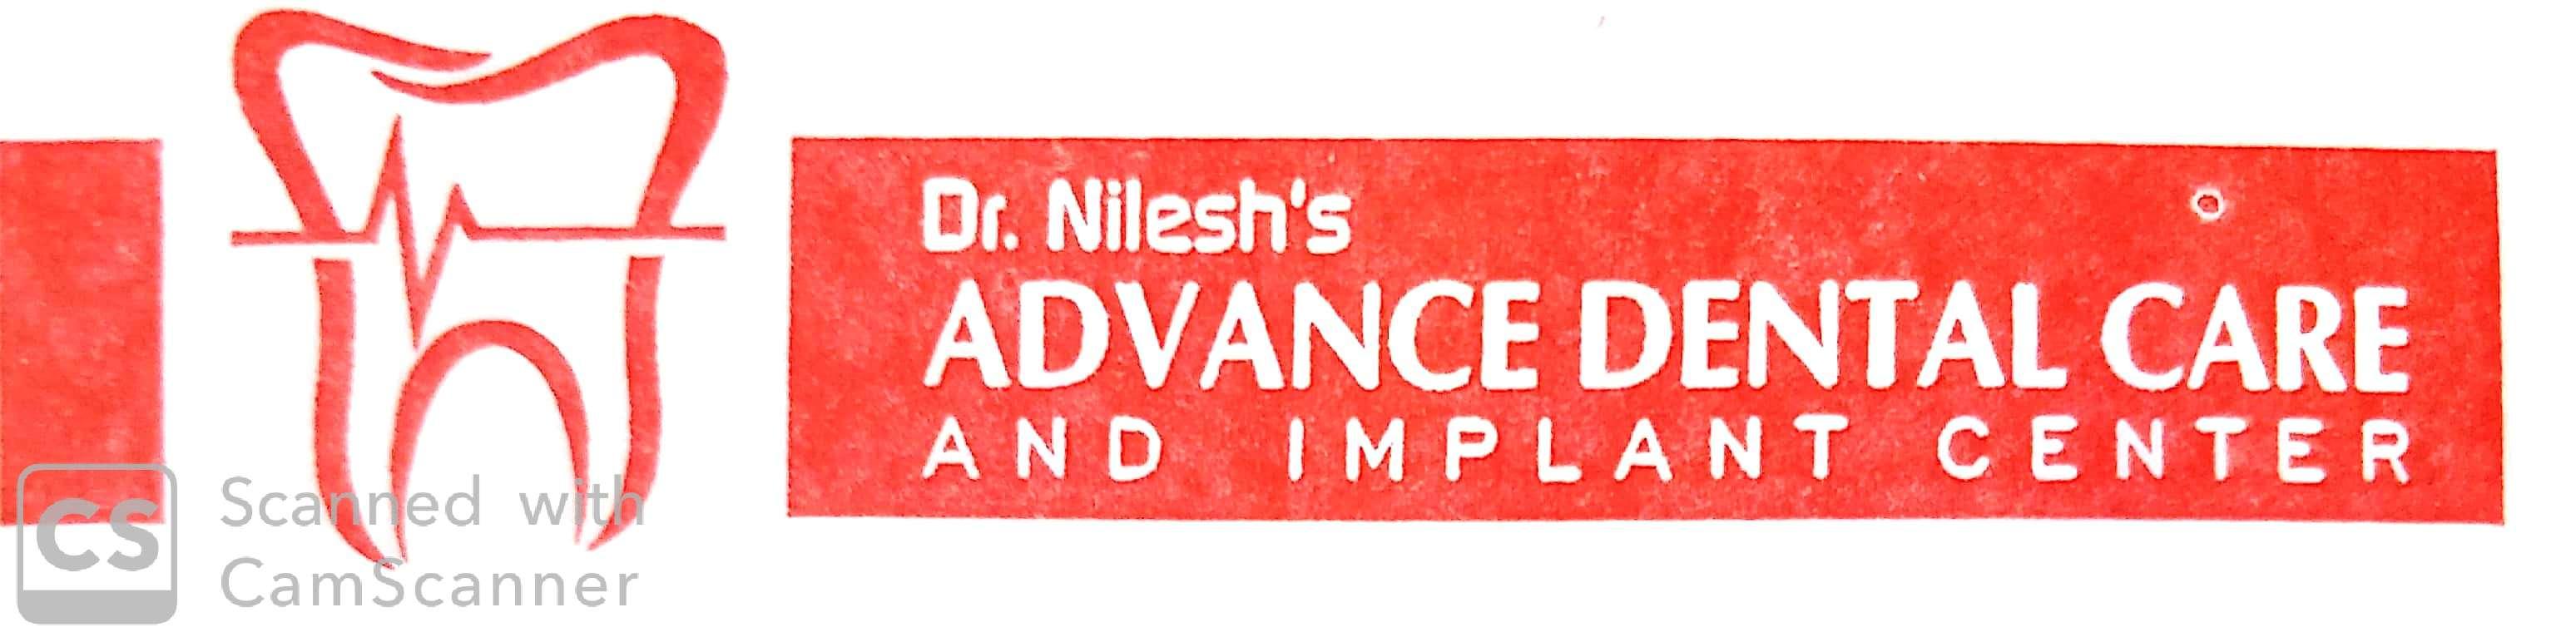 Dr Nilesh Advance Dental Care and Implant Center